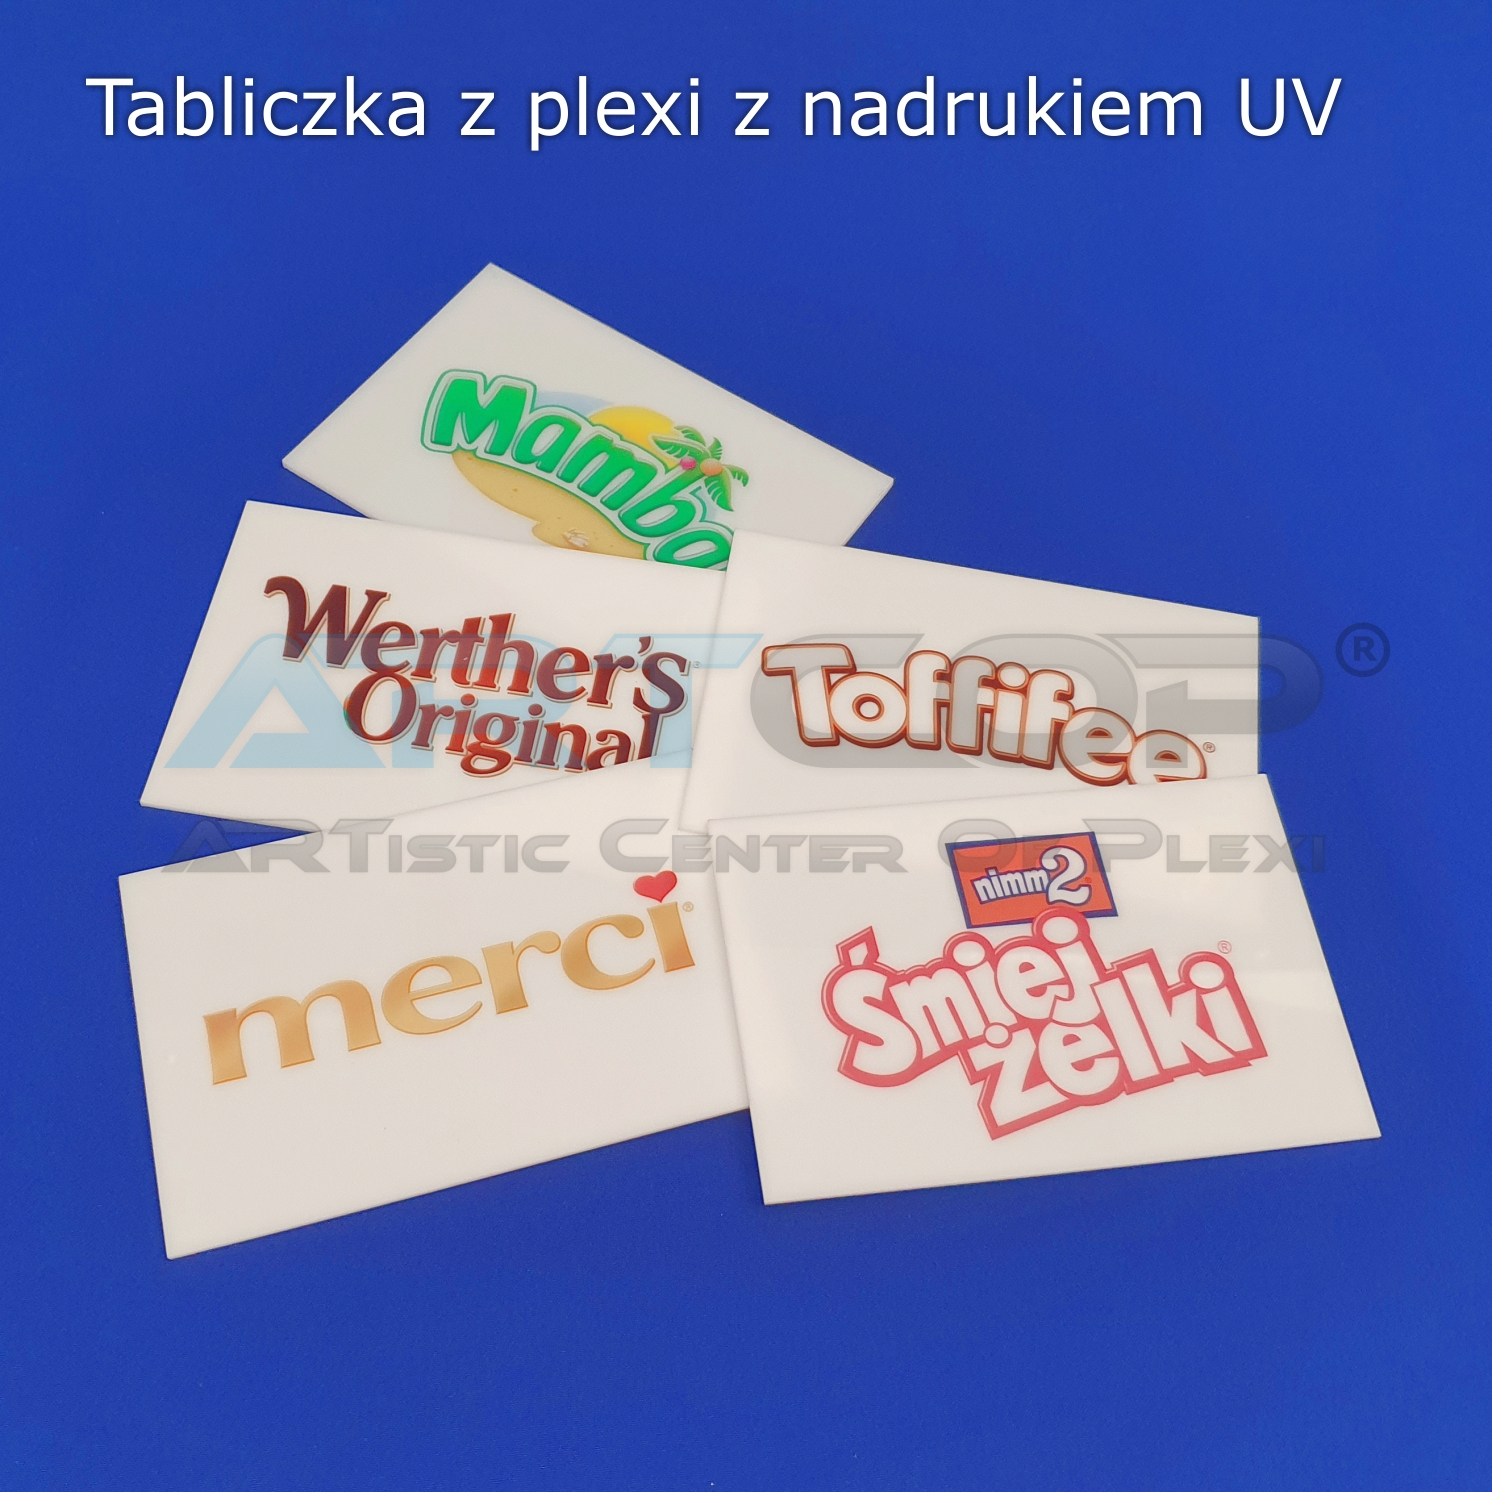 Tabliczki z nadrukiem UV - foto9.jpg